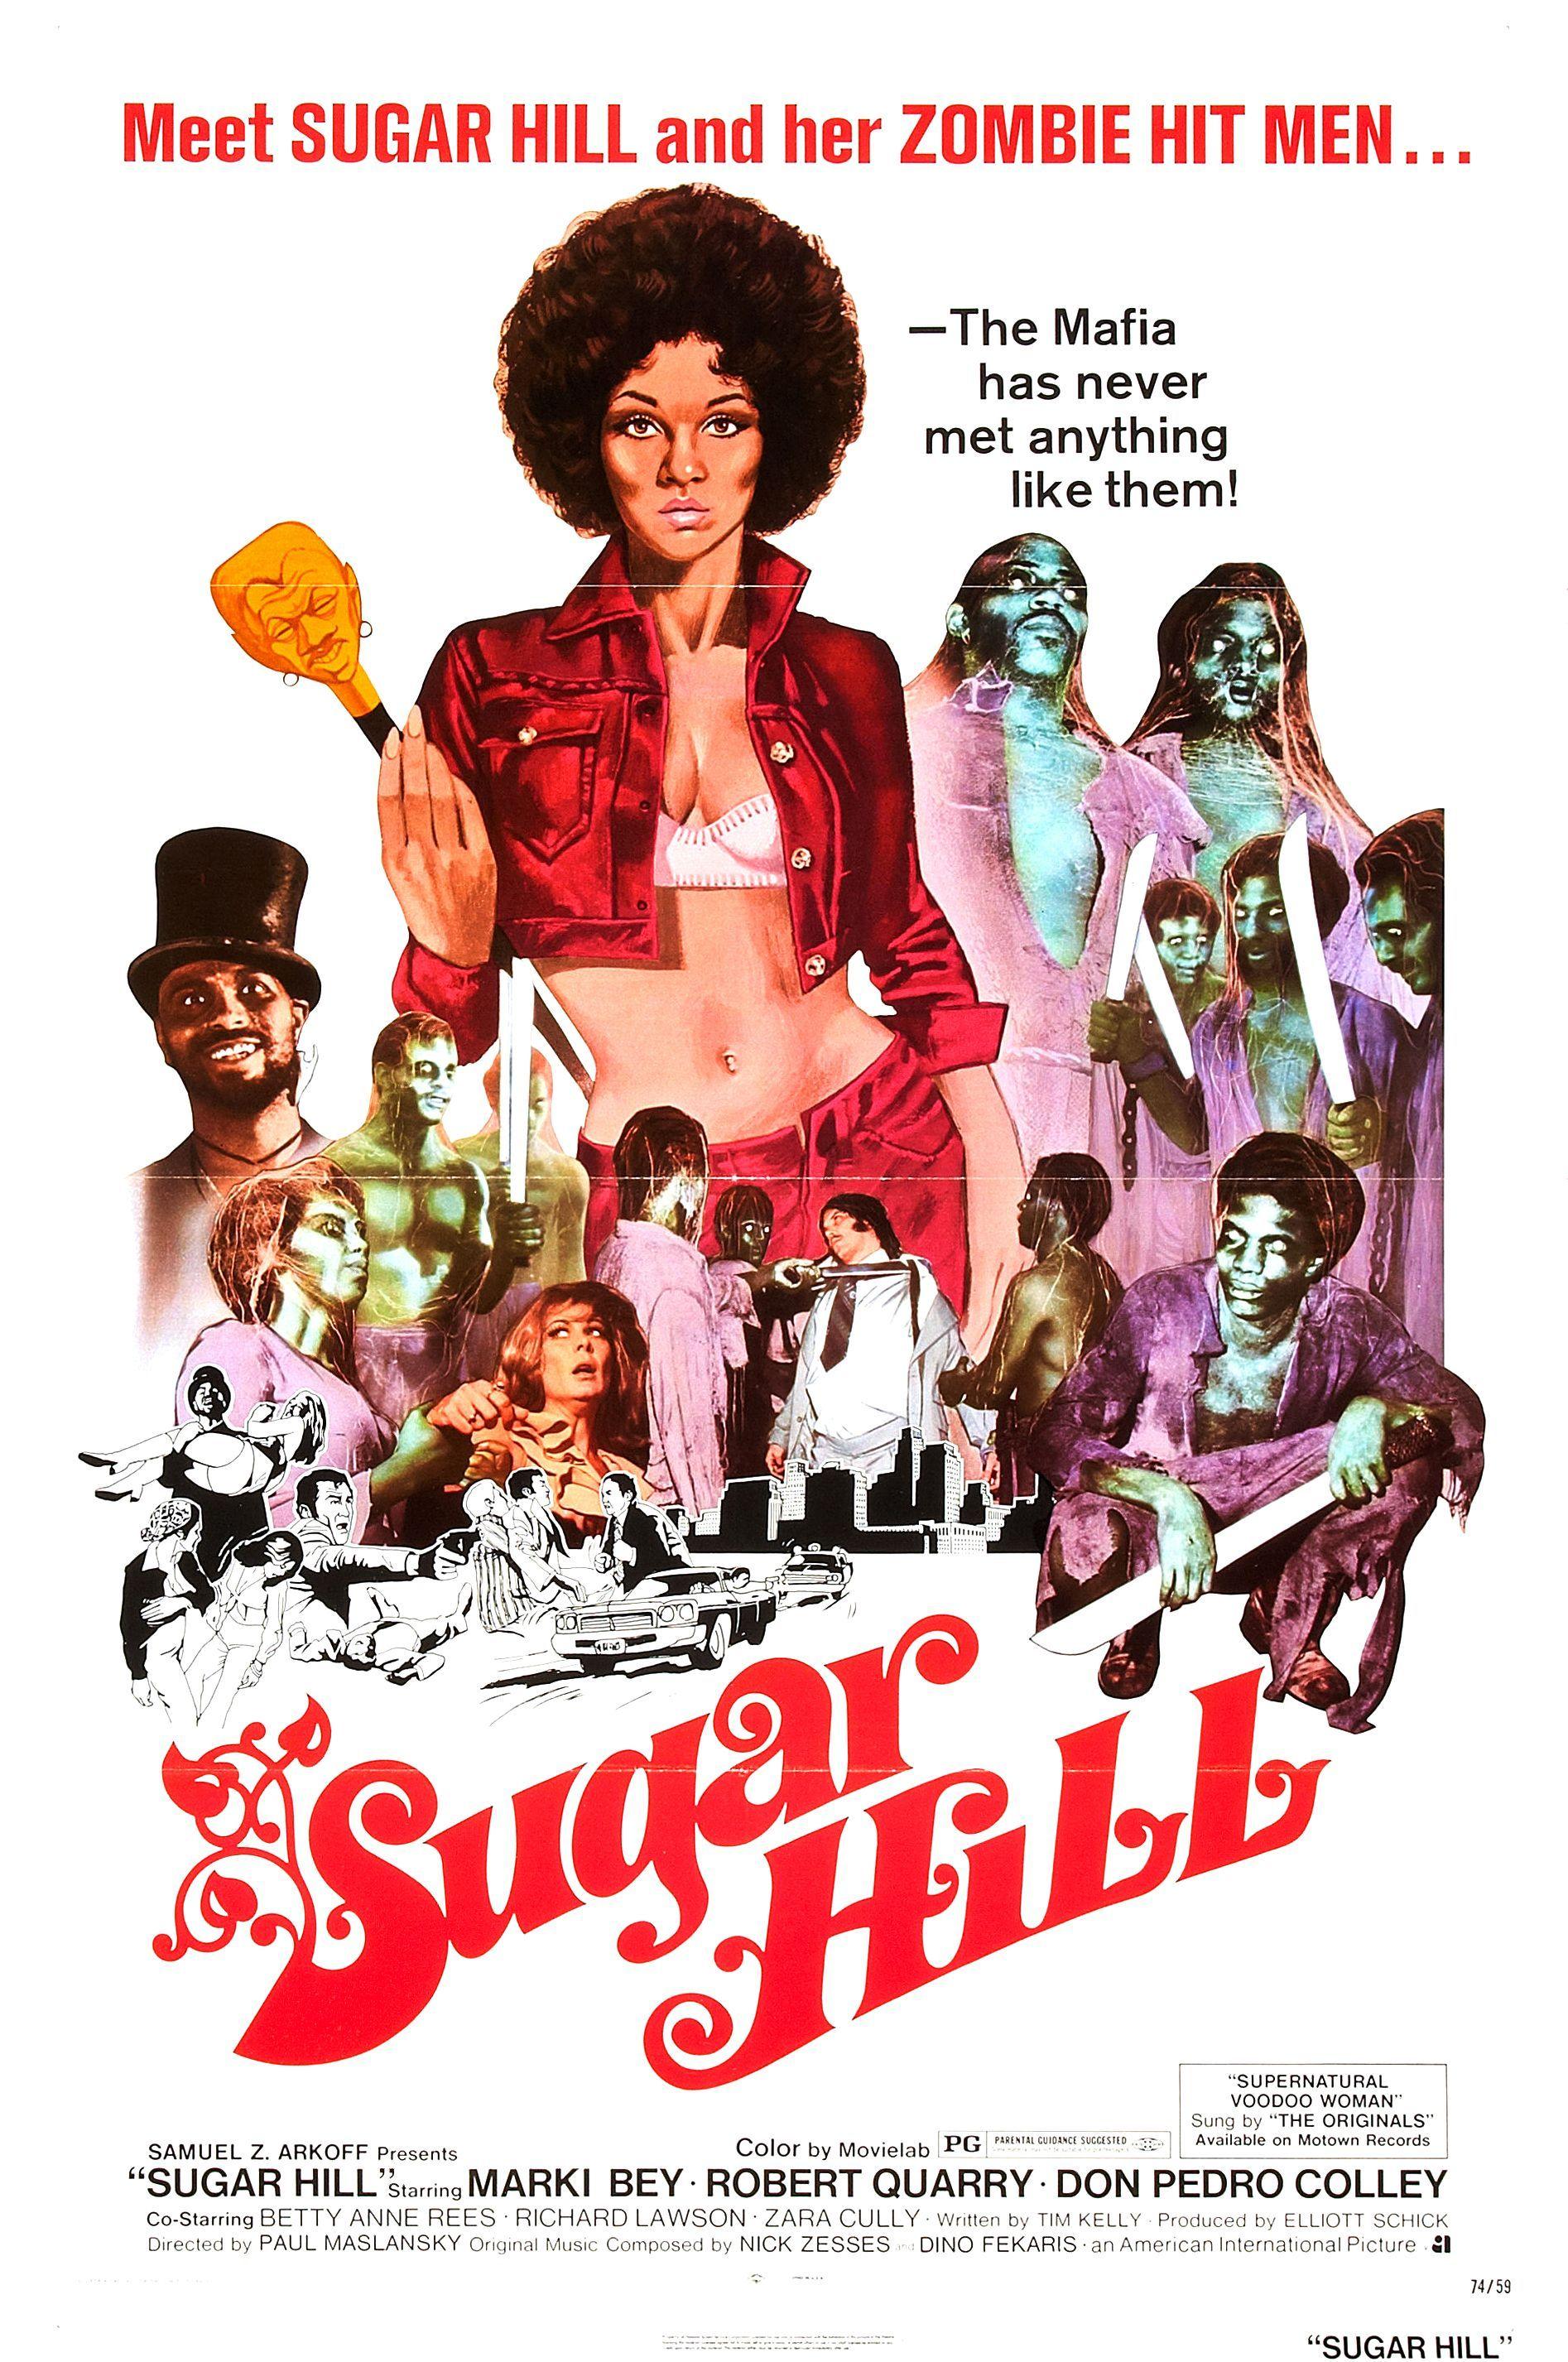 Sugar Hill 1974 Movie Posters Blaxploitation Film Classic Movie Posters